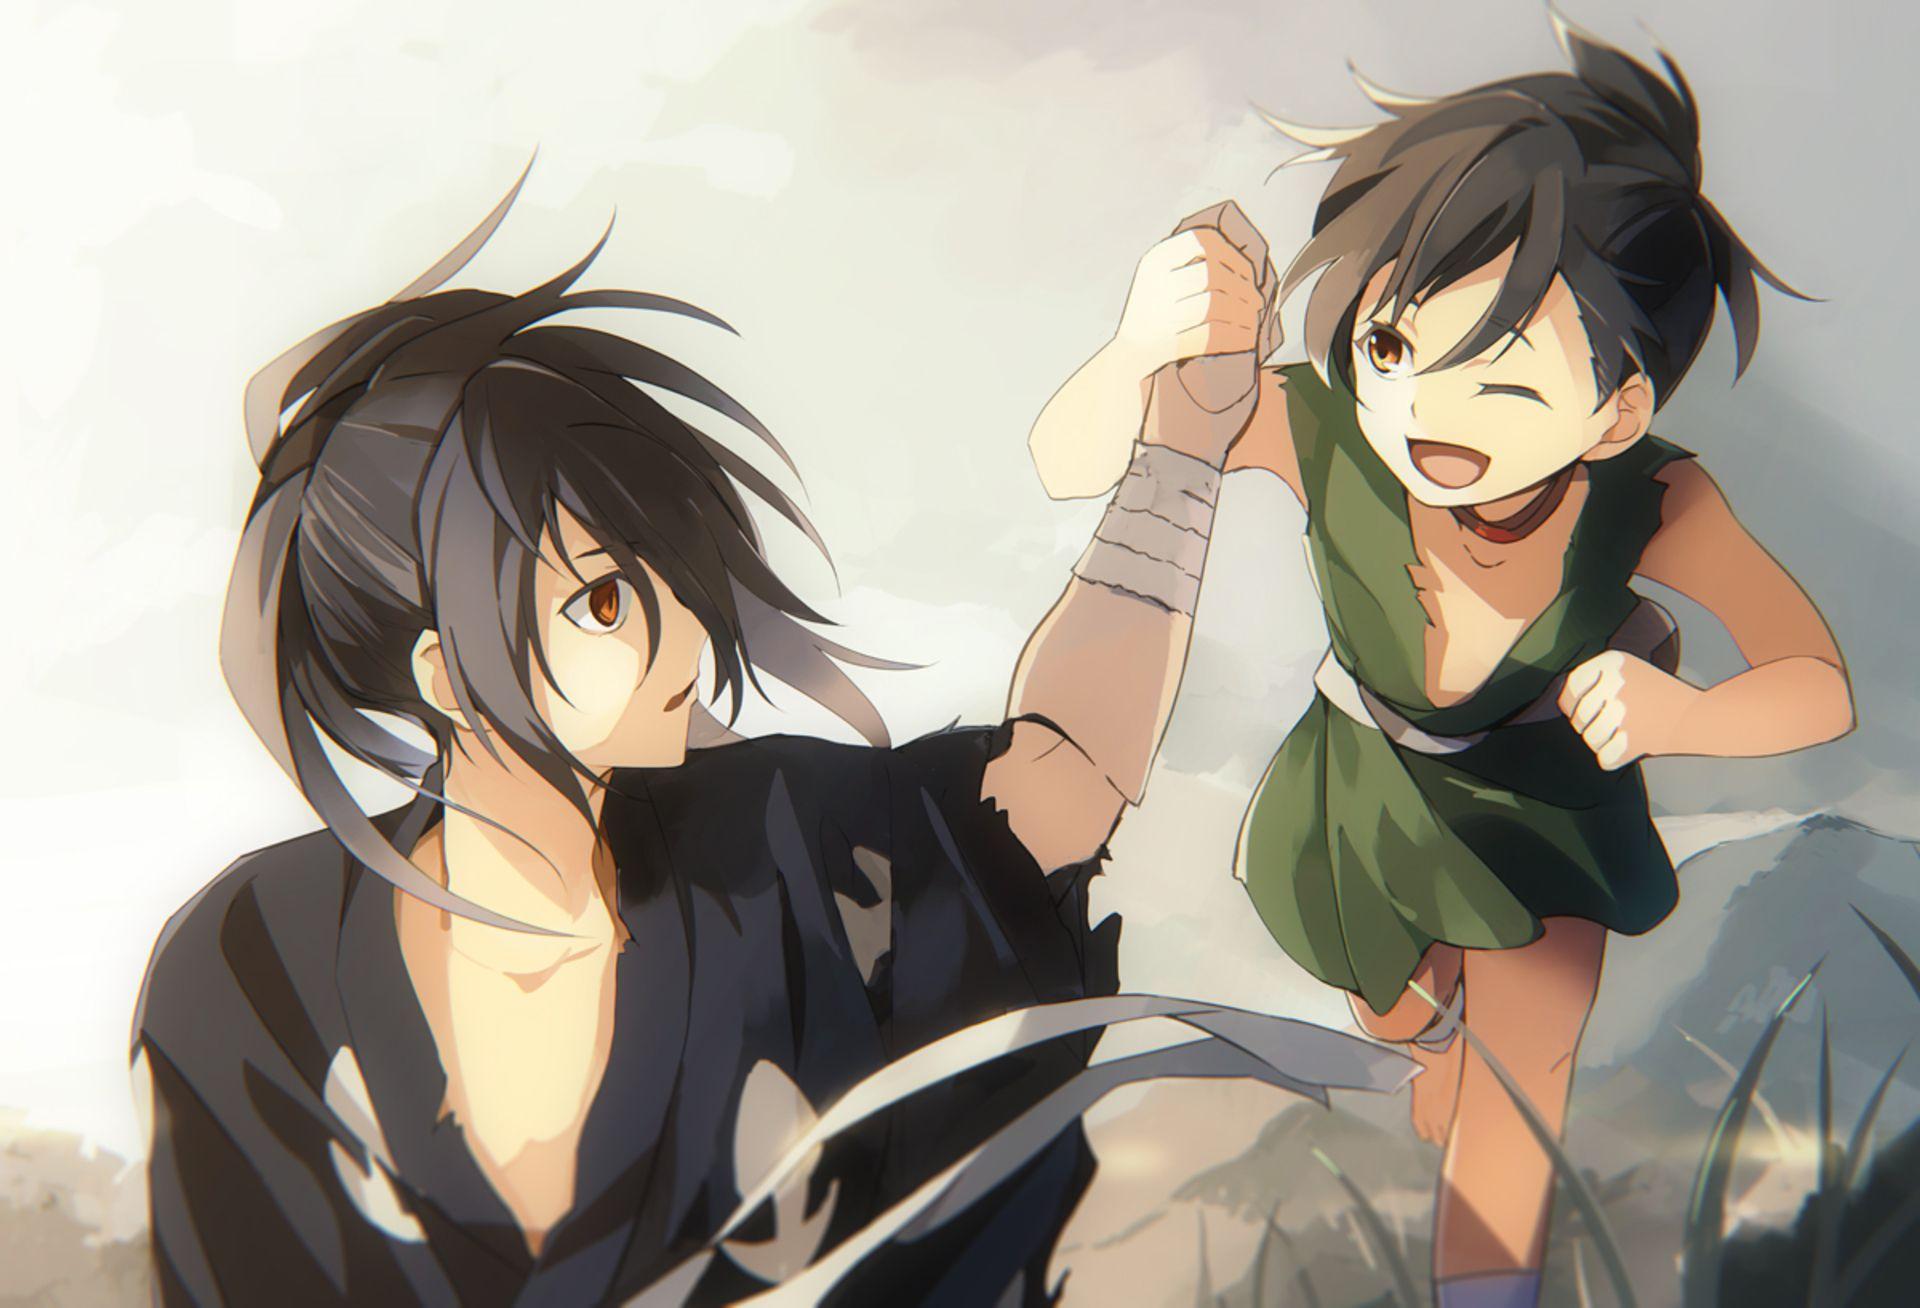 Dororo (Anime Series) HD Images Anime, Anime nerd, Anime